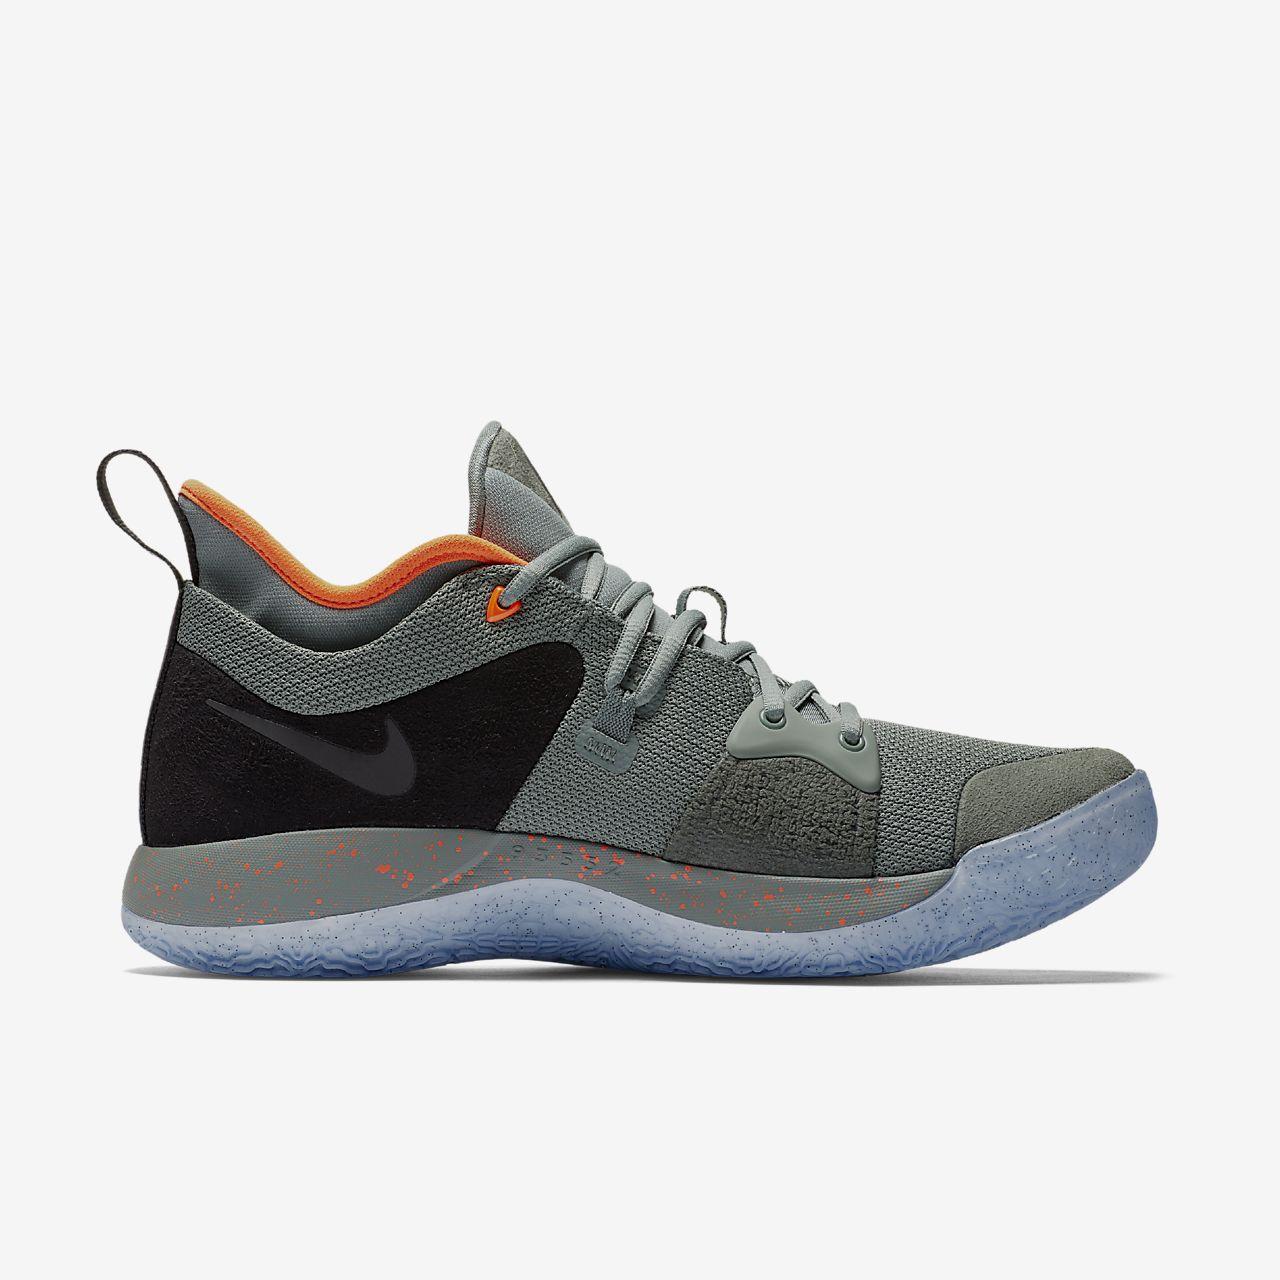 quality design 16ae4 4429d nike pg 2 chaussures pour vente